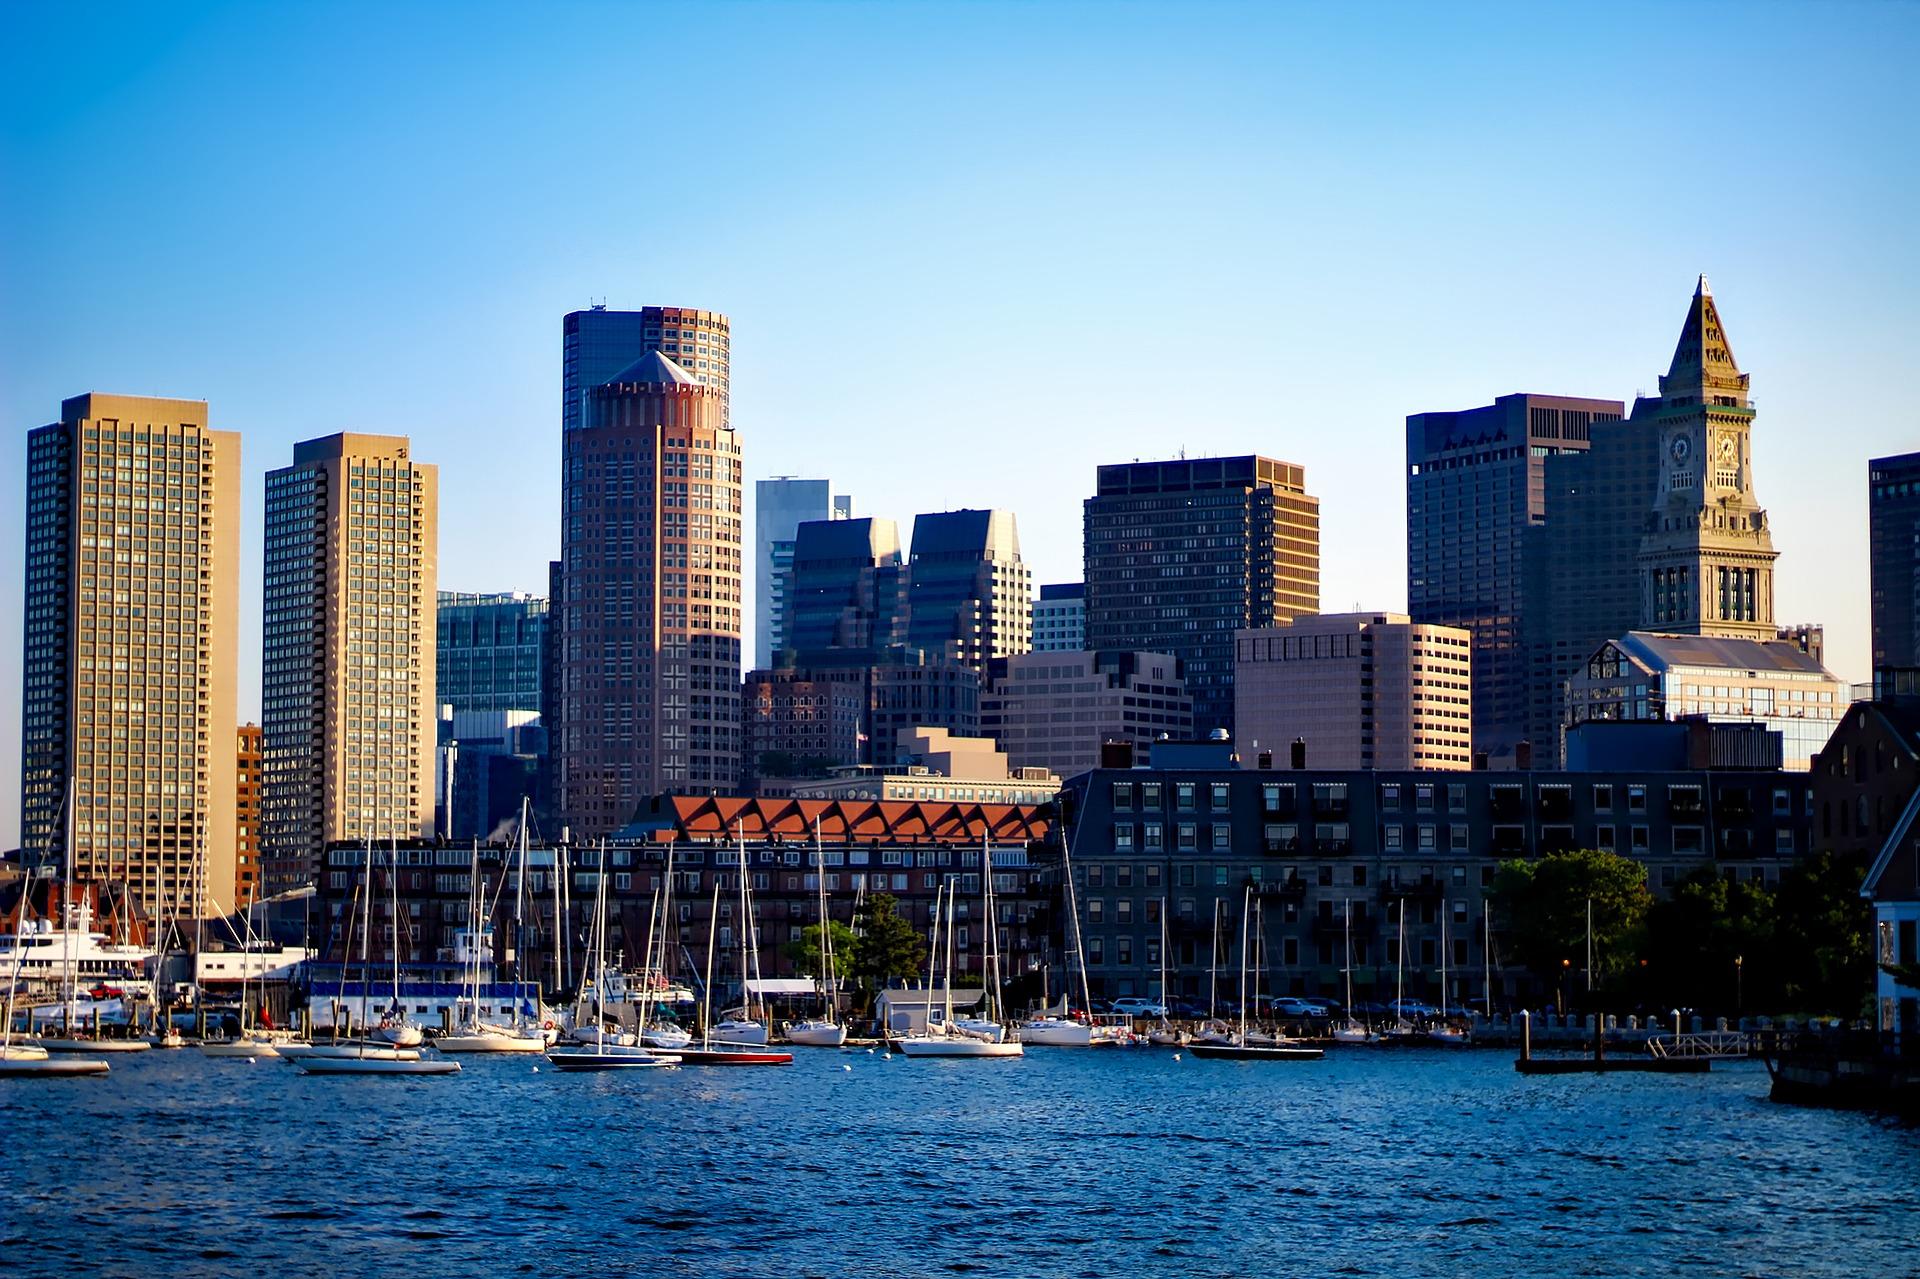 boston-1775870_1920.jpg